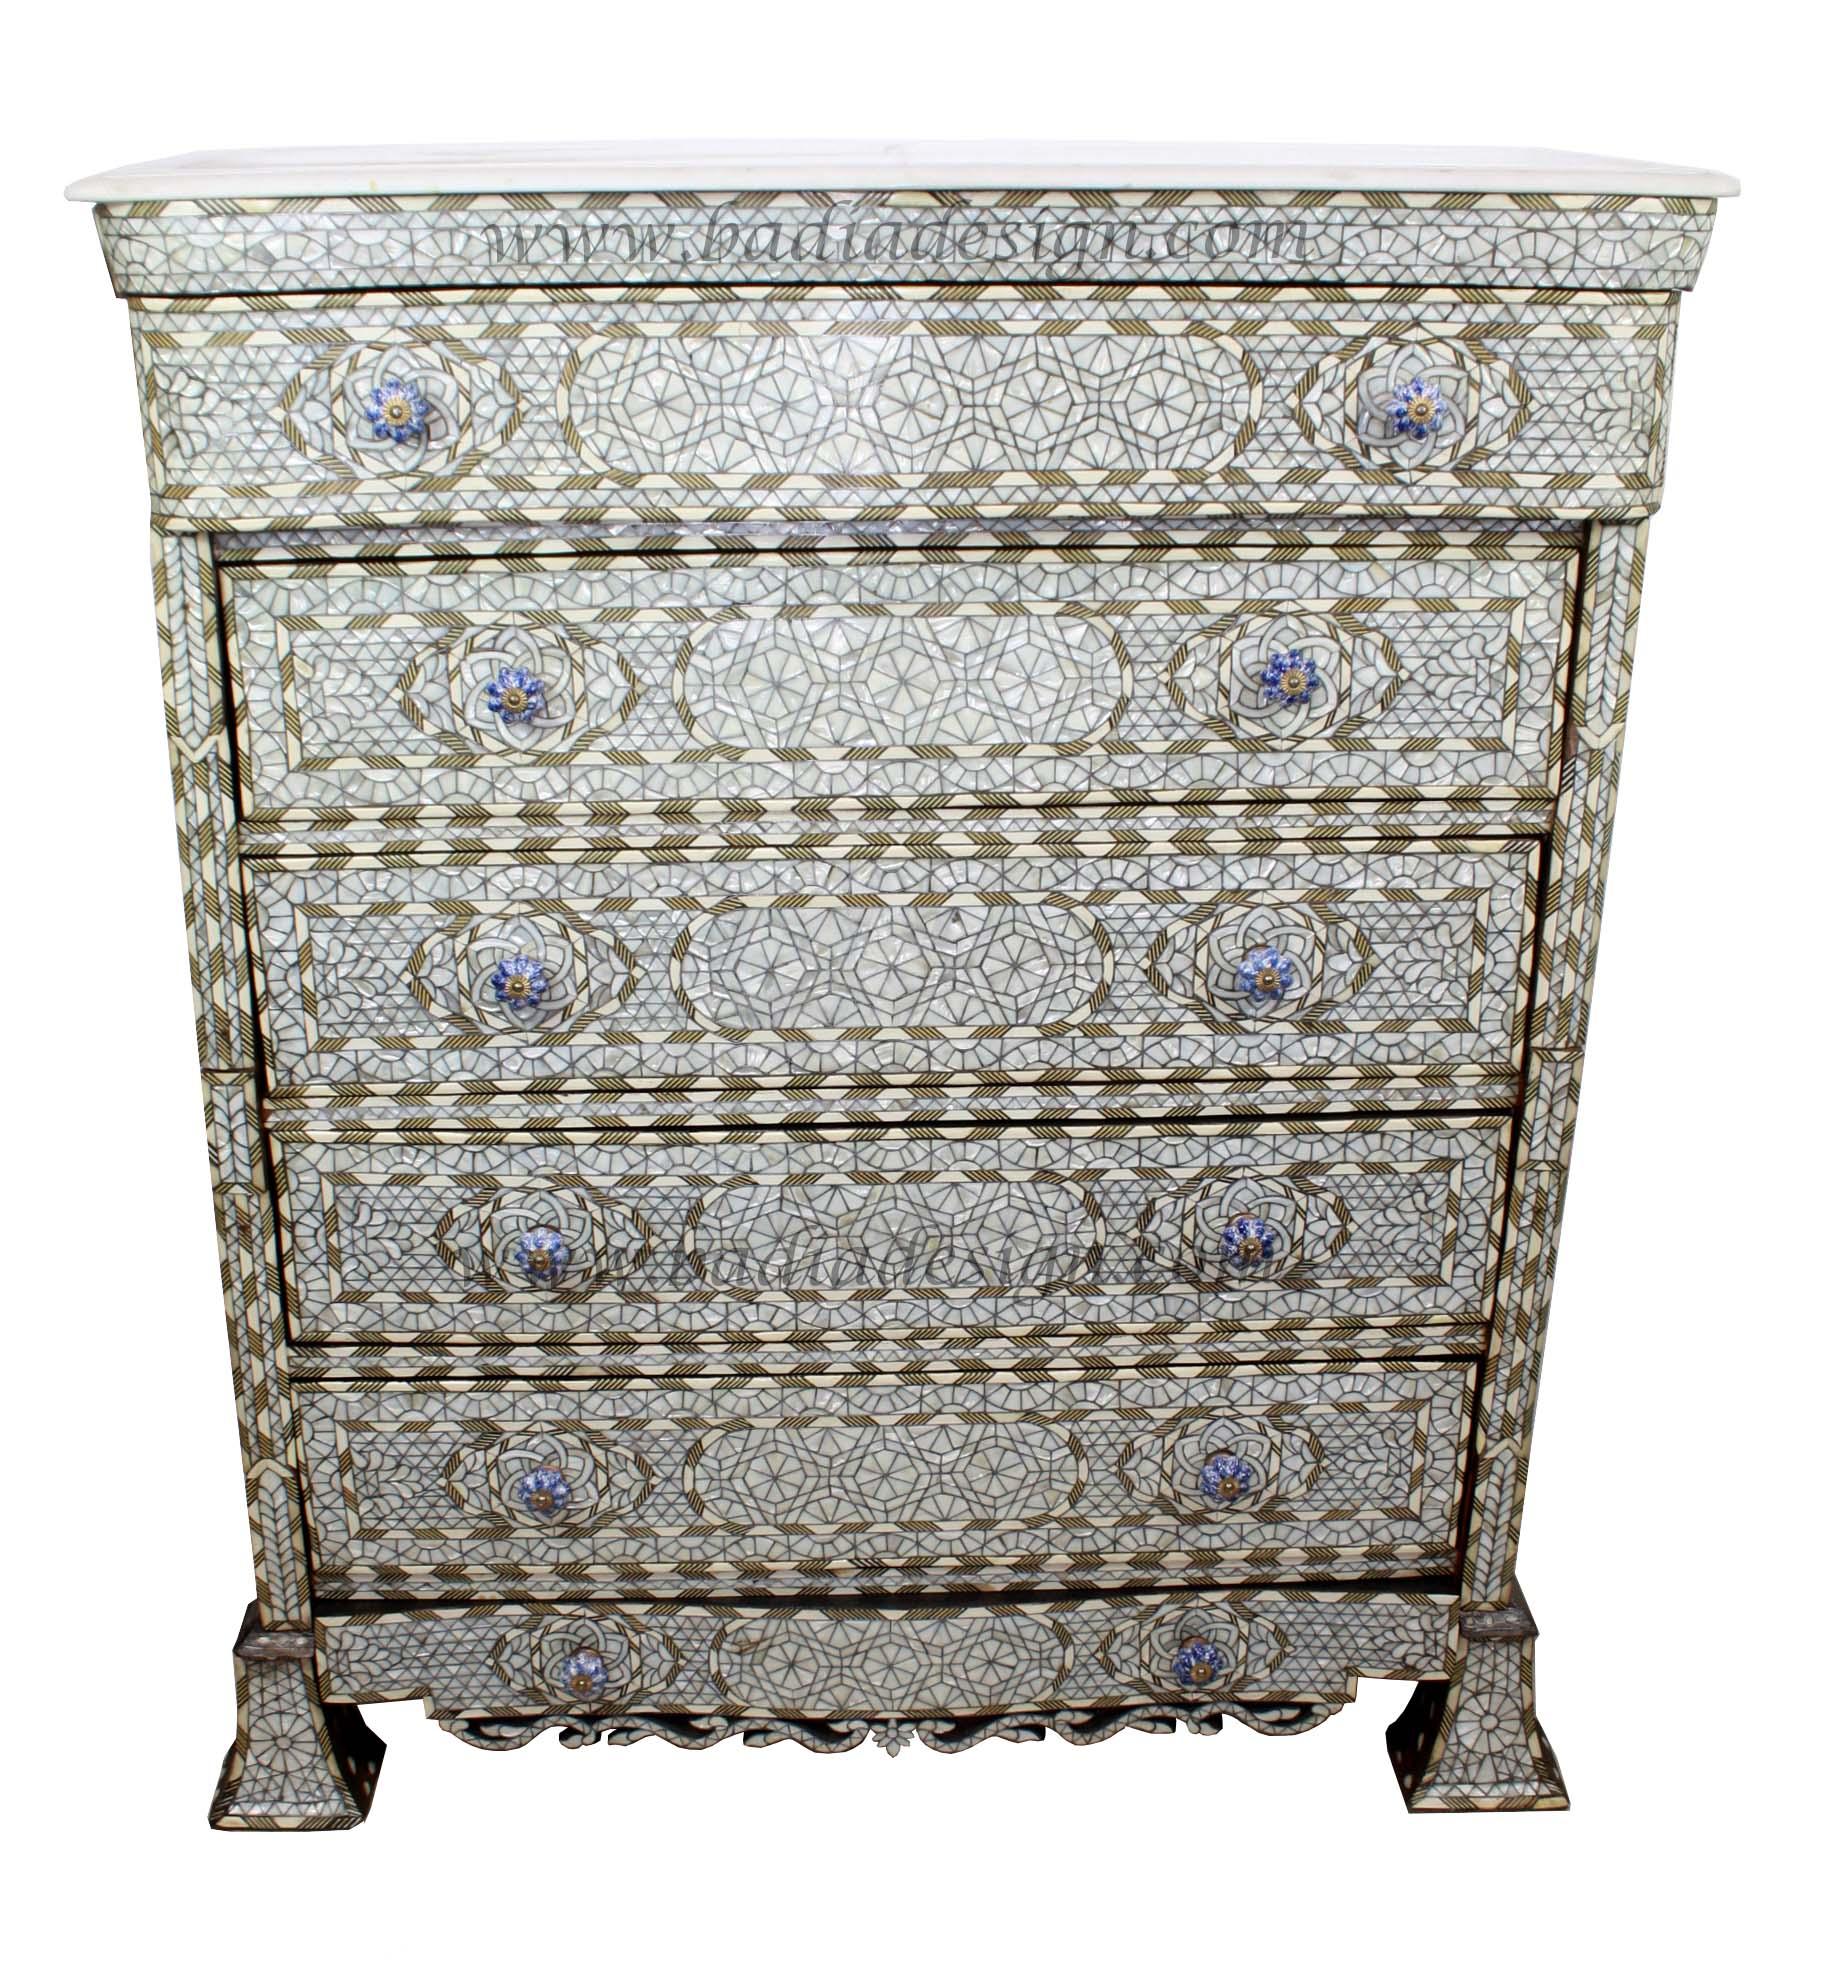 high-end-moroccan-furniture-mop-dr055-1.jpg